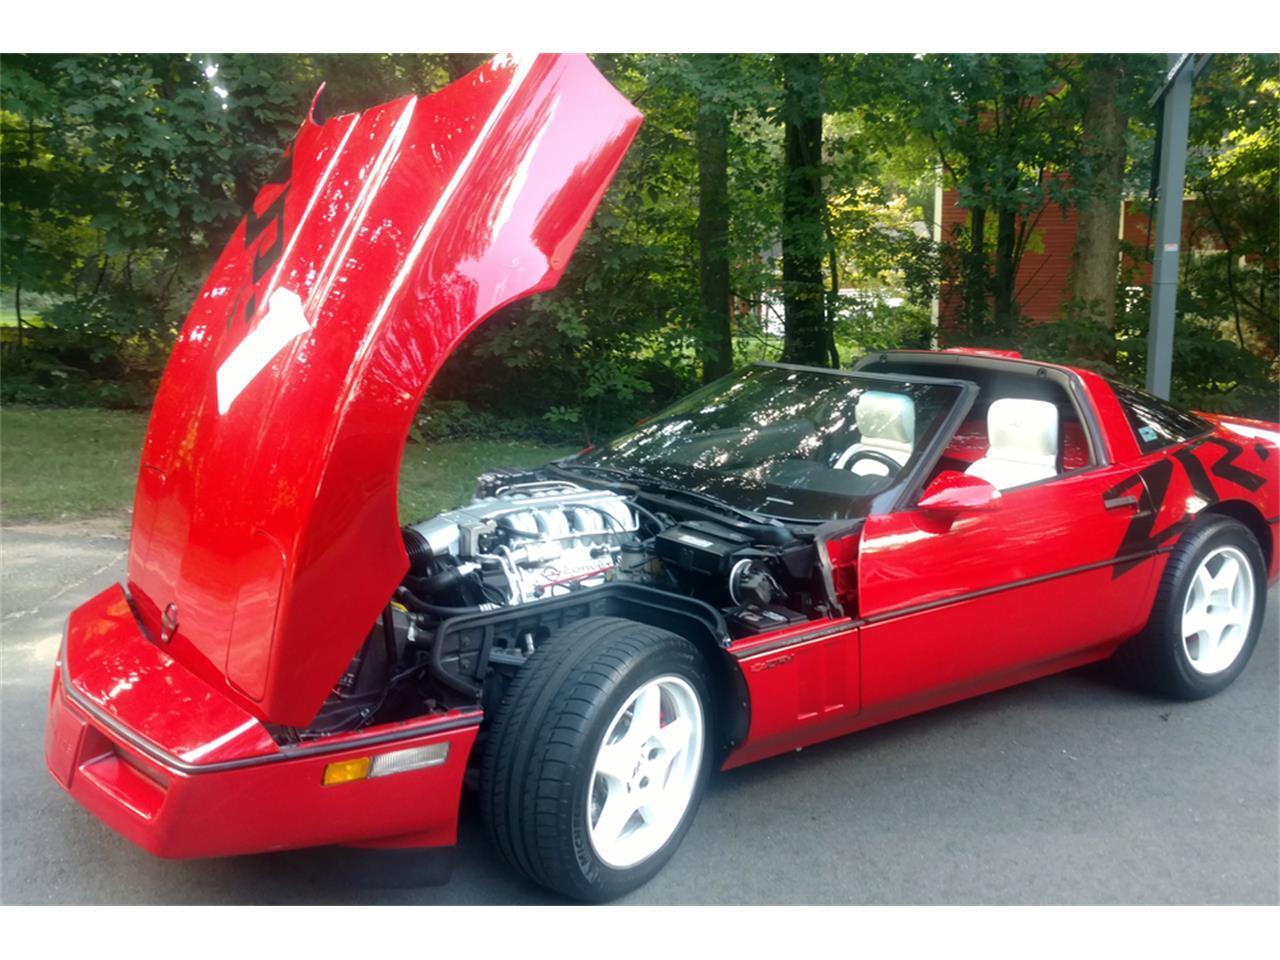 Large Picture of 1990 Corvette located in Connecticut Auction Vehicle - QBC3